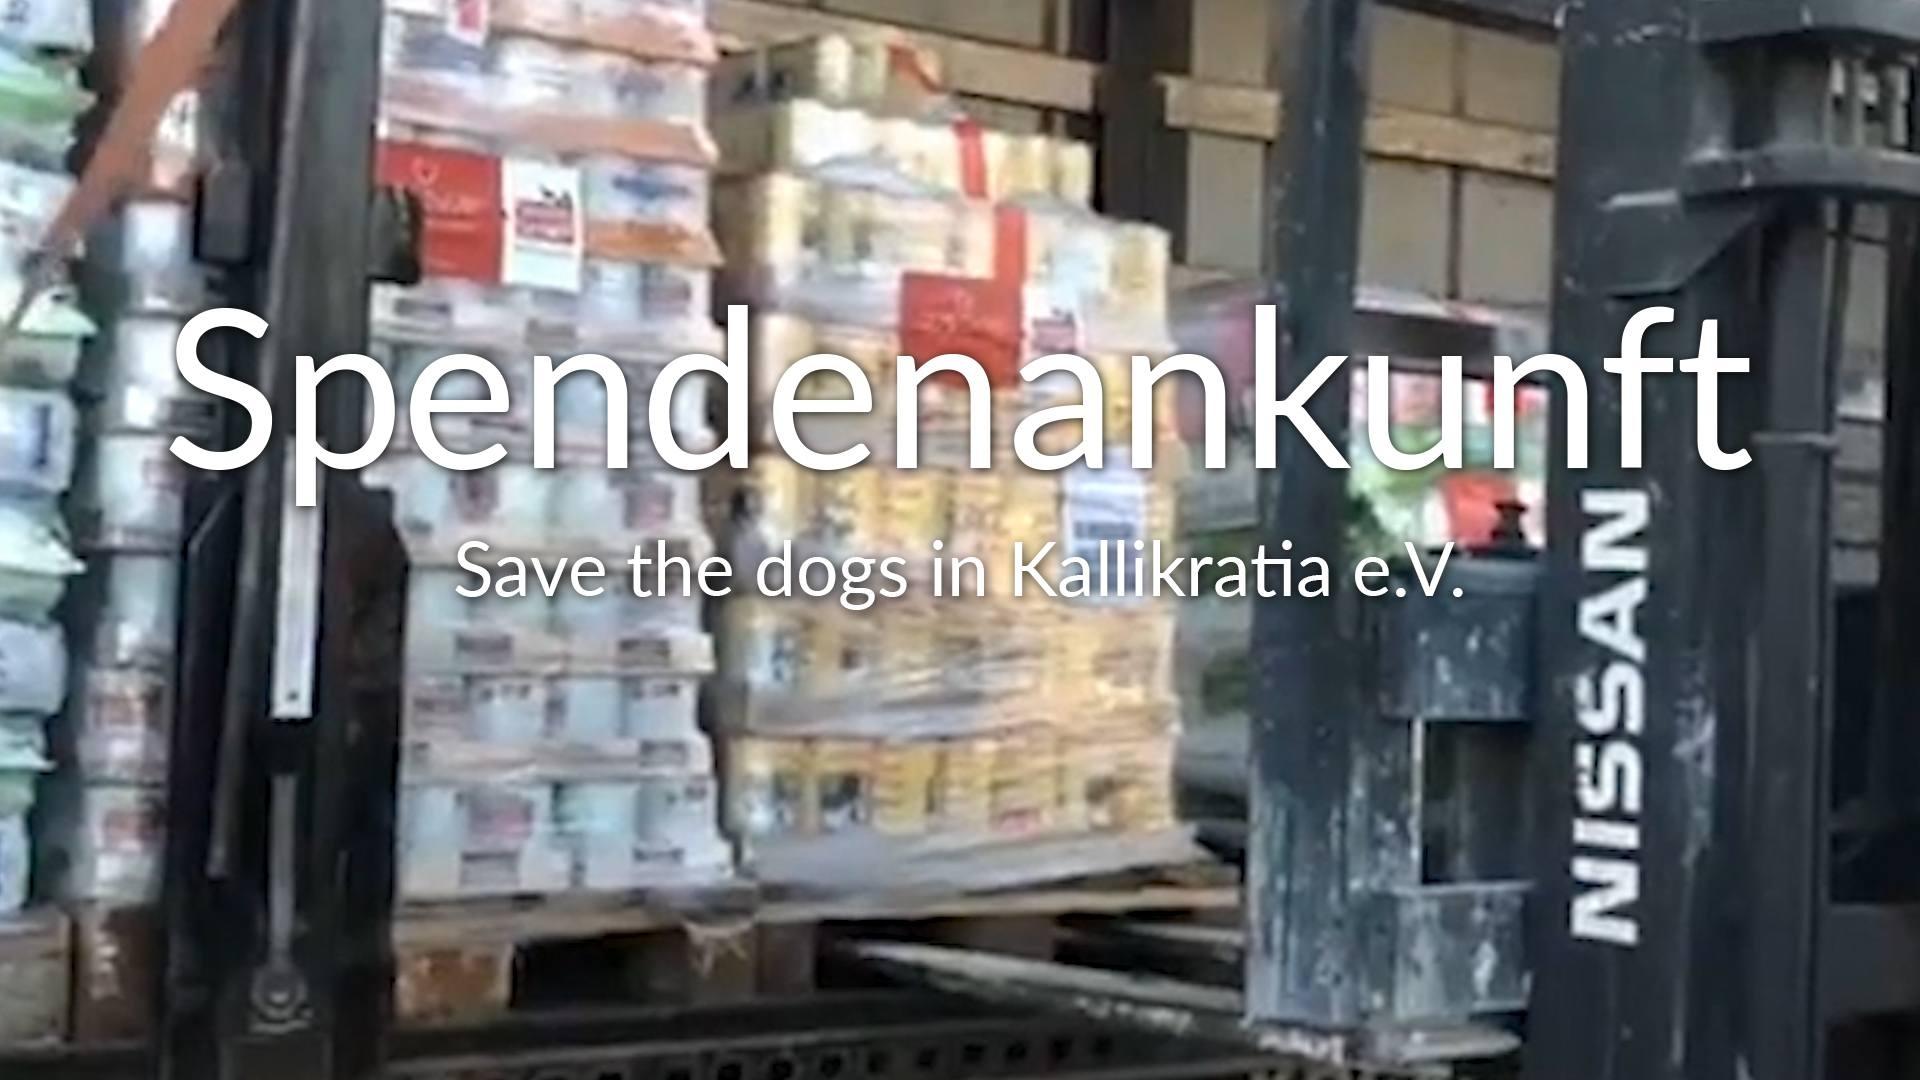 Save the dogs in Kallikratia e.V.-Futterspendenankunft-oktober 2019-WL-Griechenland VIDEO